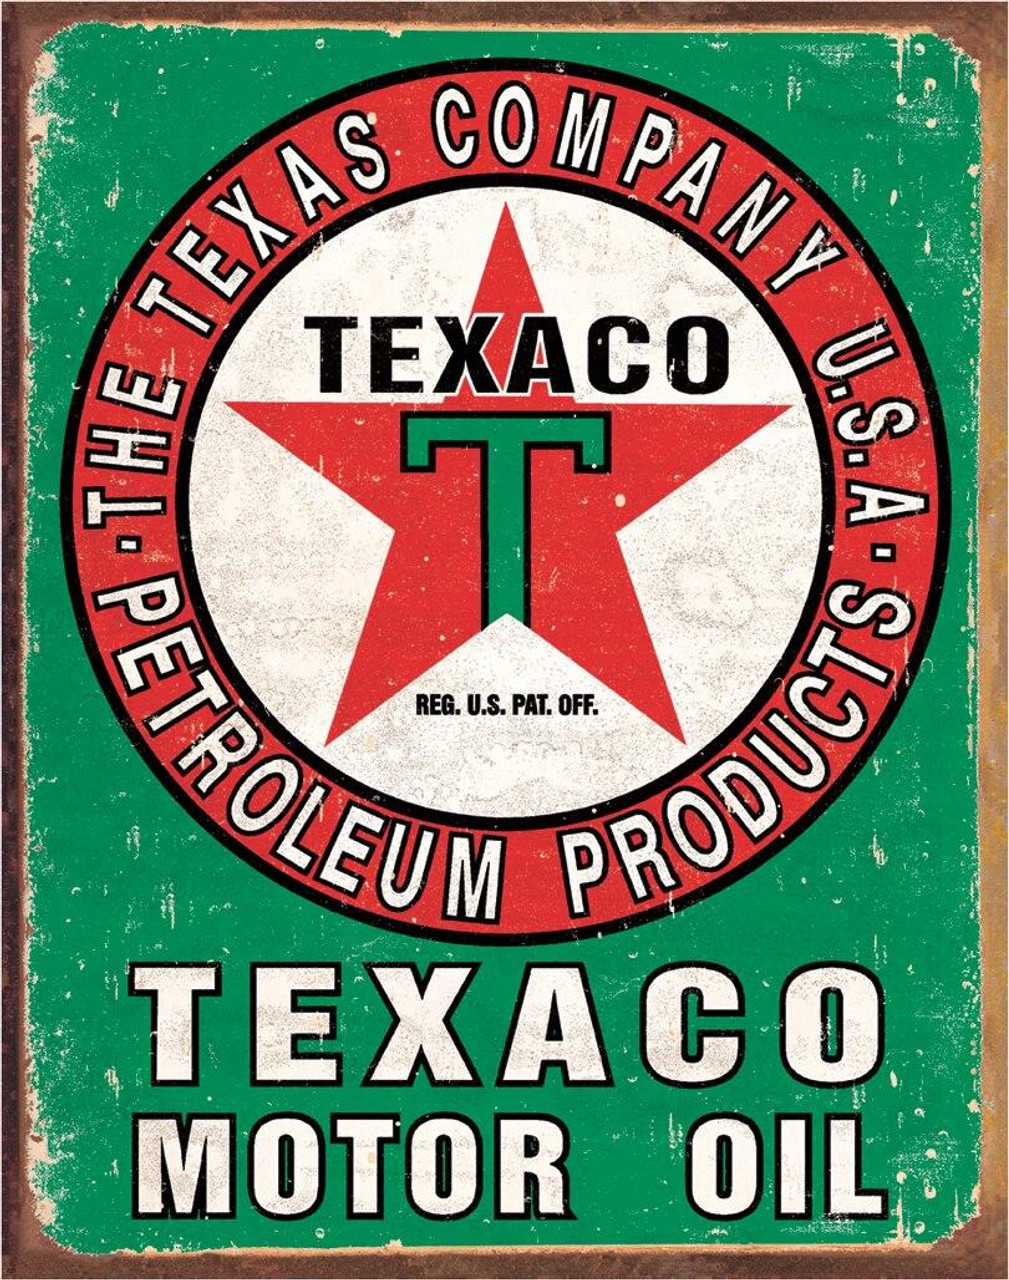 Texaco Texaco Oil Weathered